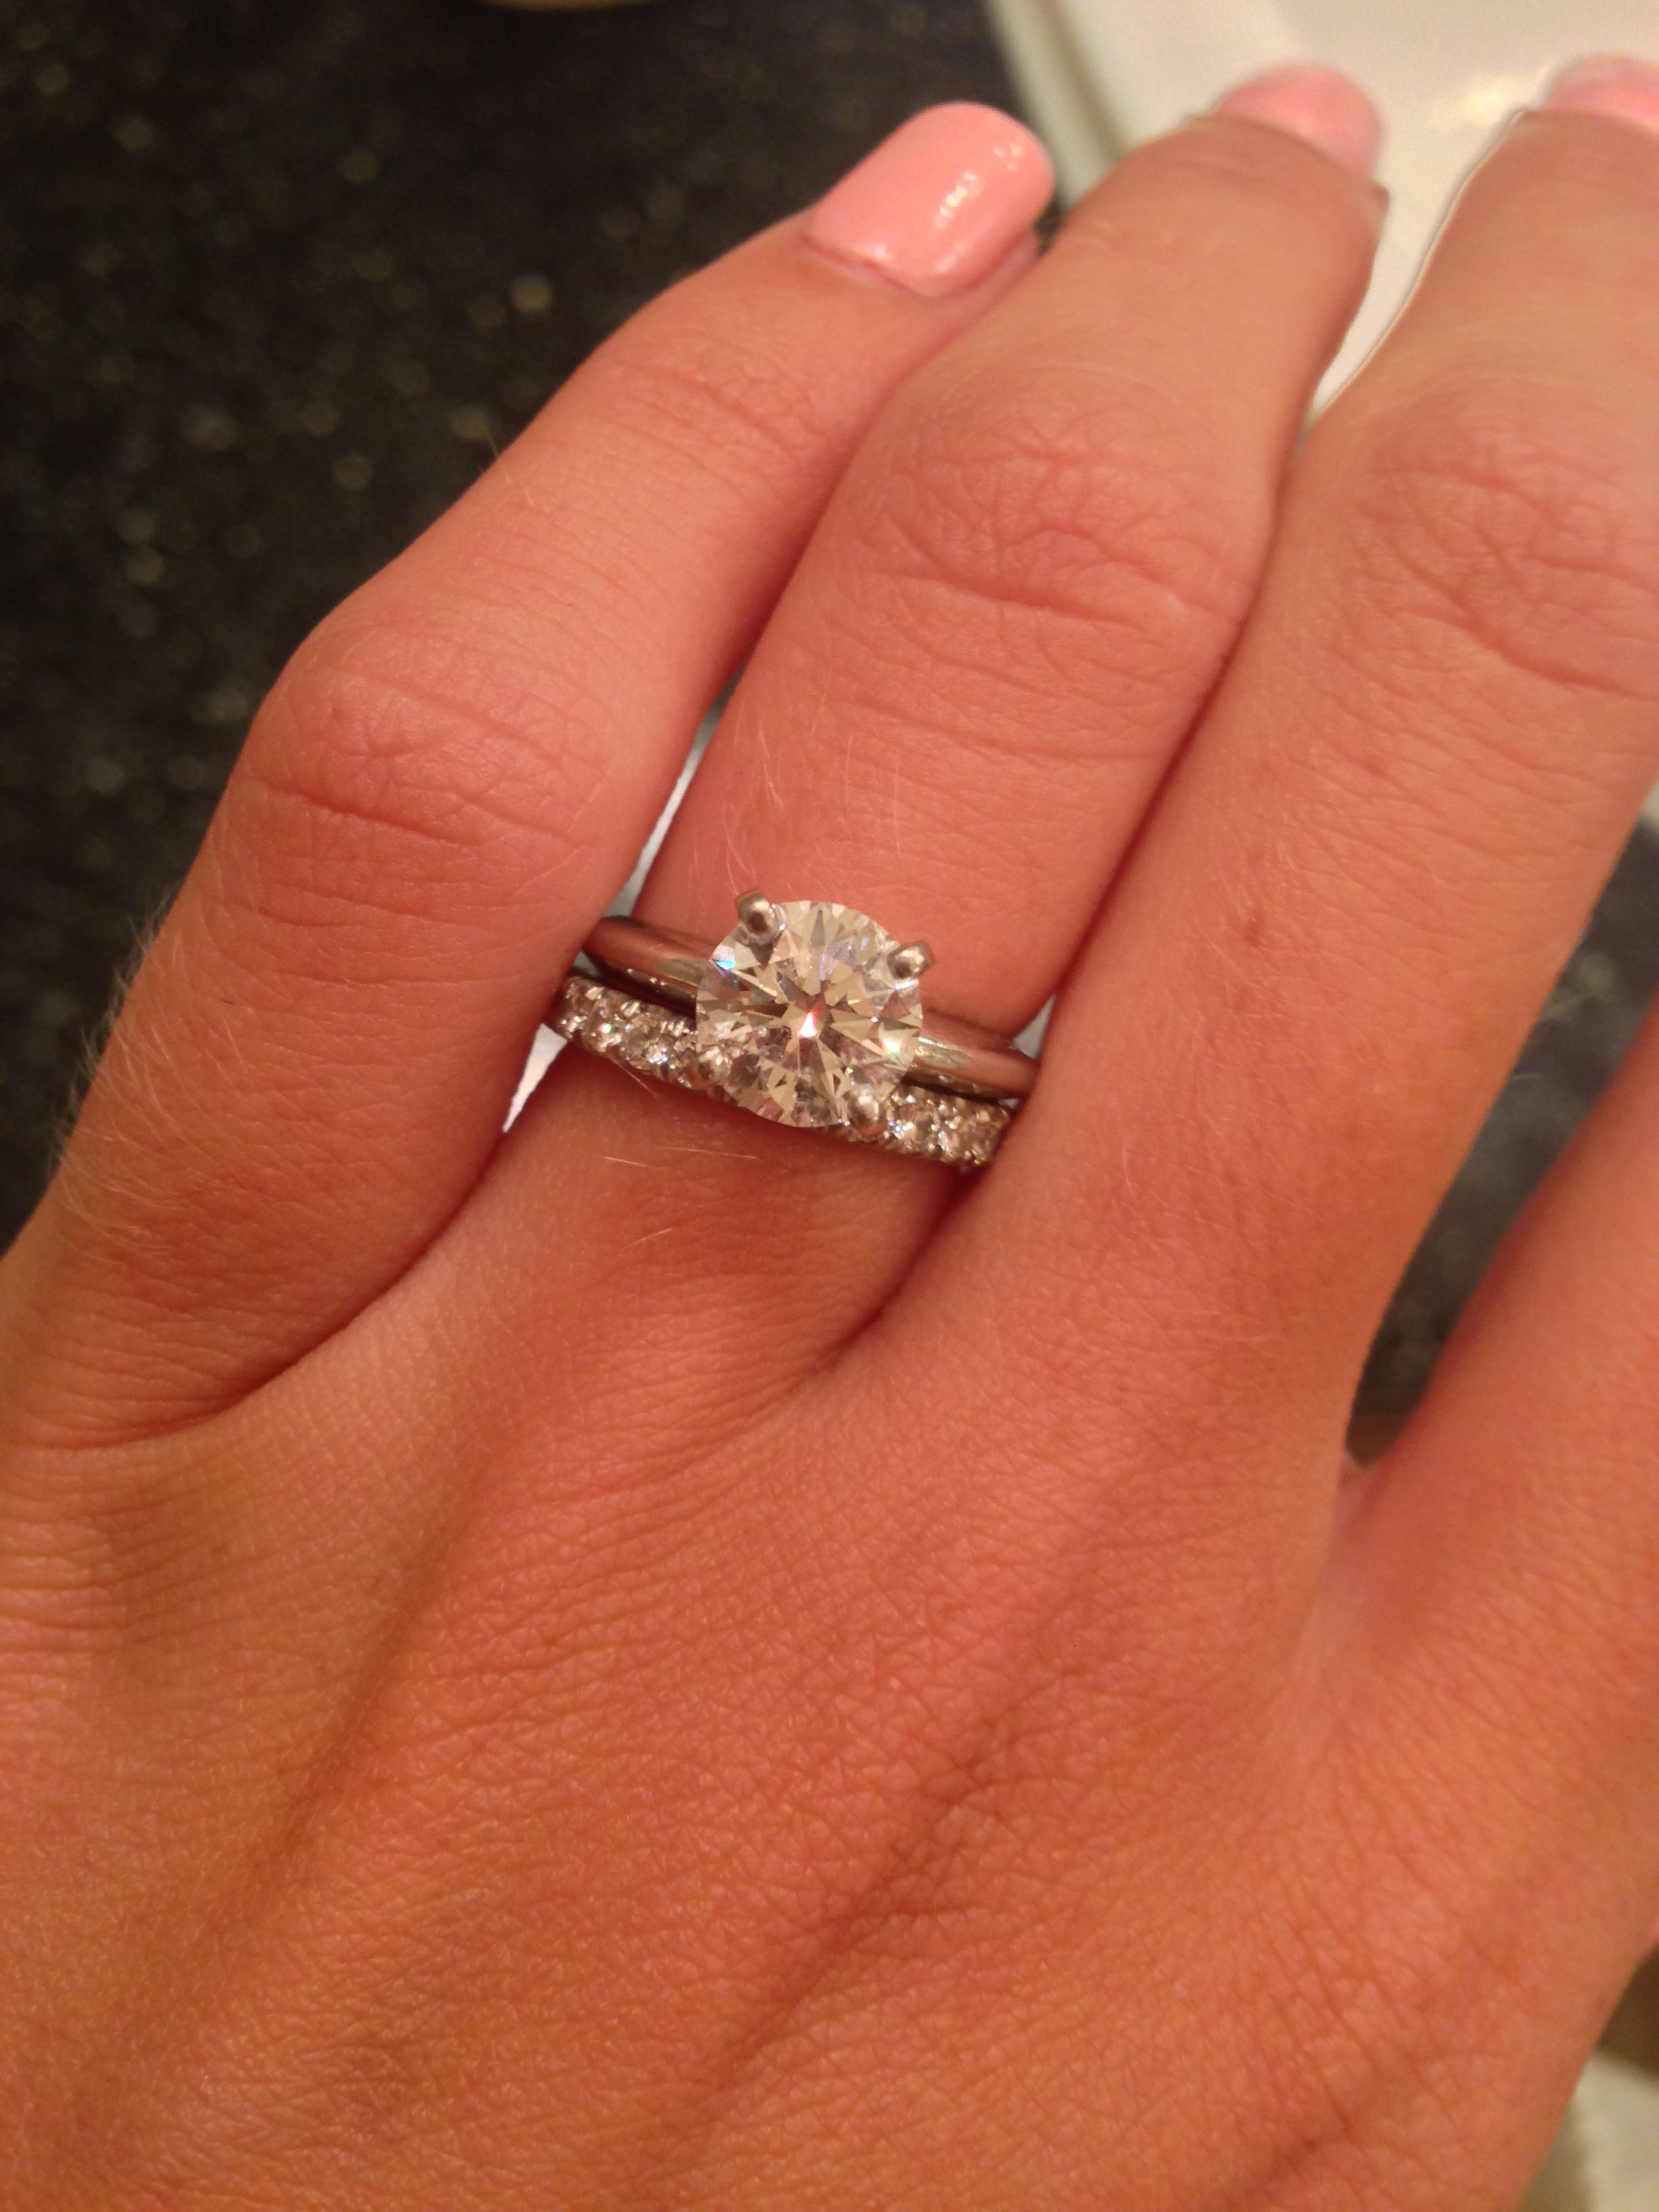 infinity diamond wedding band Show me your diamond wedding band with your solitaire e ring Weddingbee Page